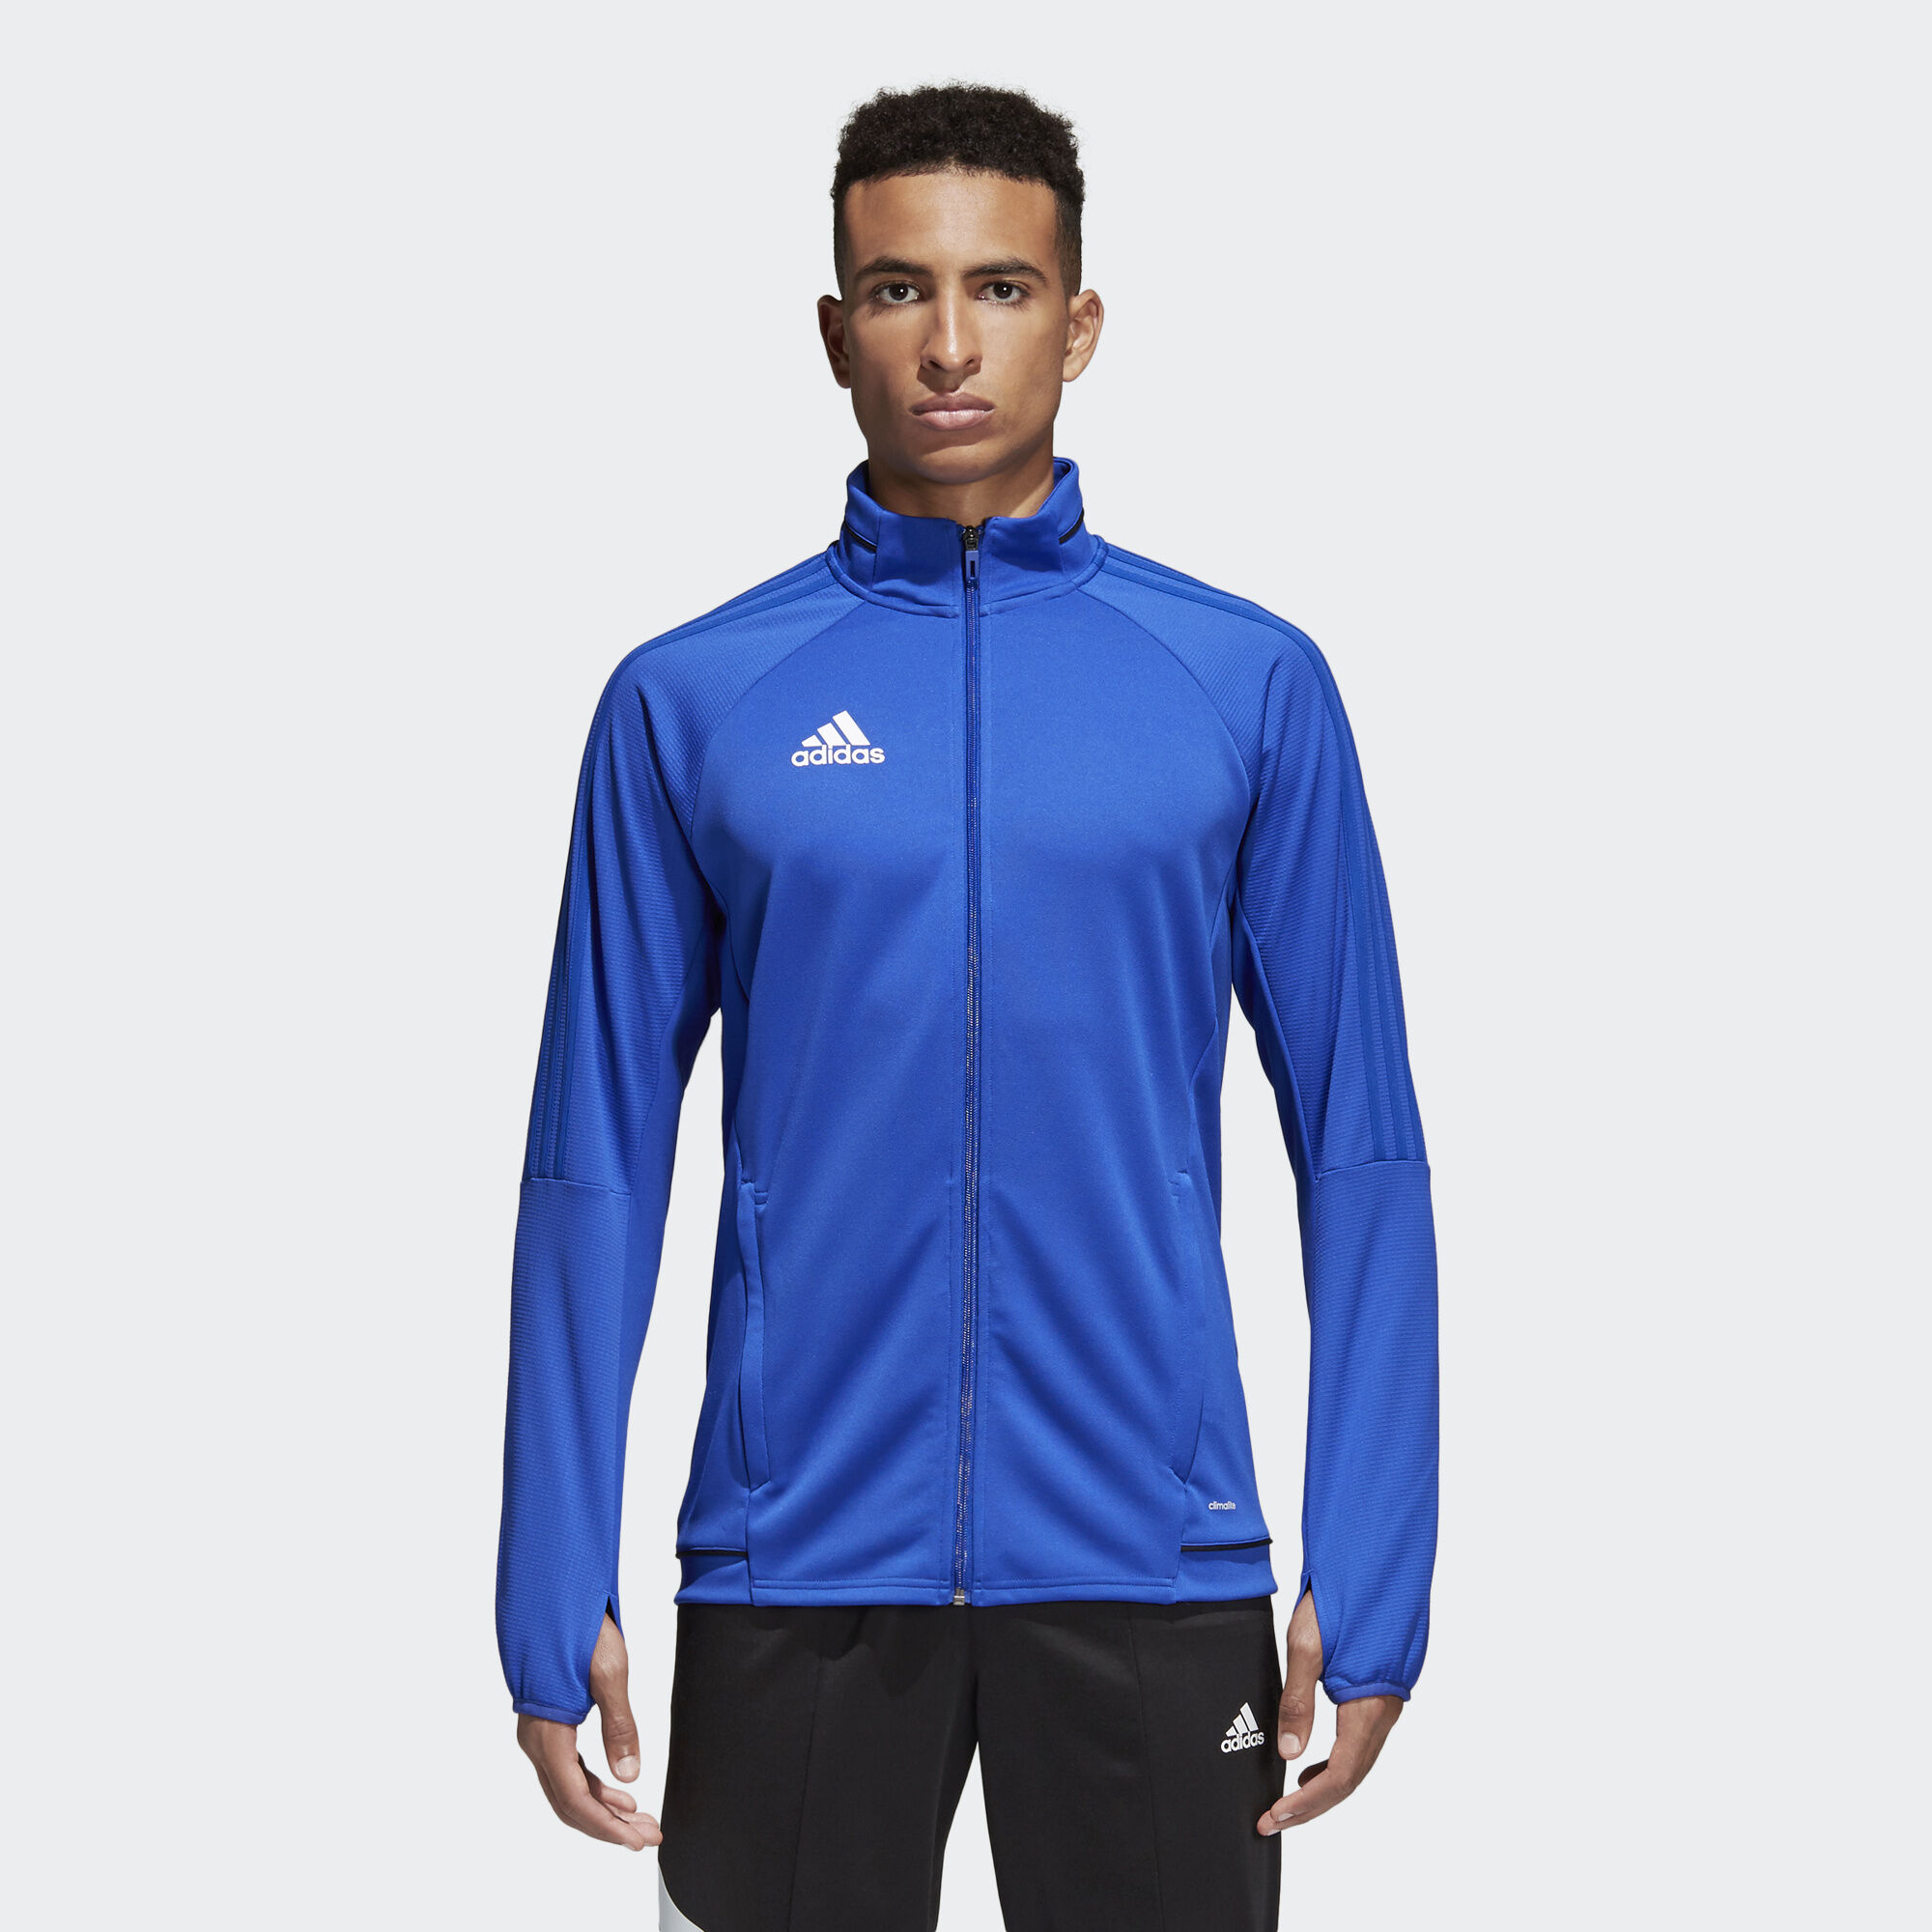 Mens jacket light blue - Adidas Tiro 17 Training Jacket Bold Blue Black White Bq8201